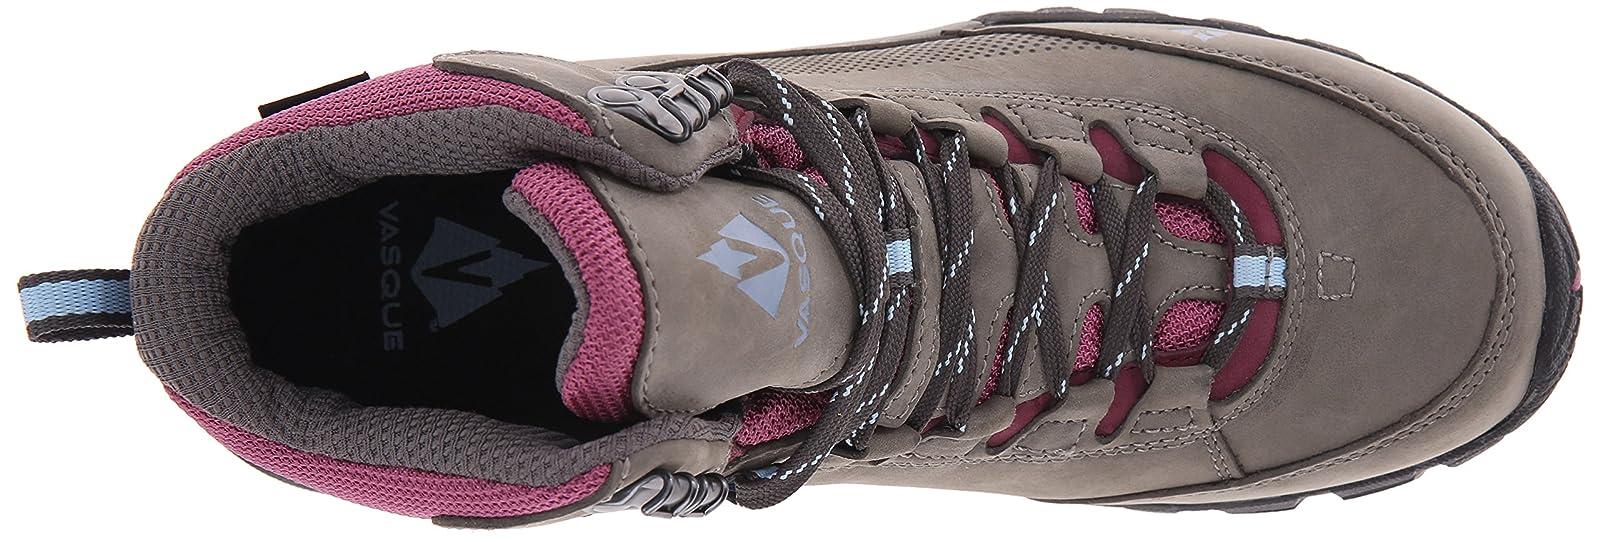 Vasque Women's Talus Trek UltraDry Hiking Boot US - 6